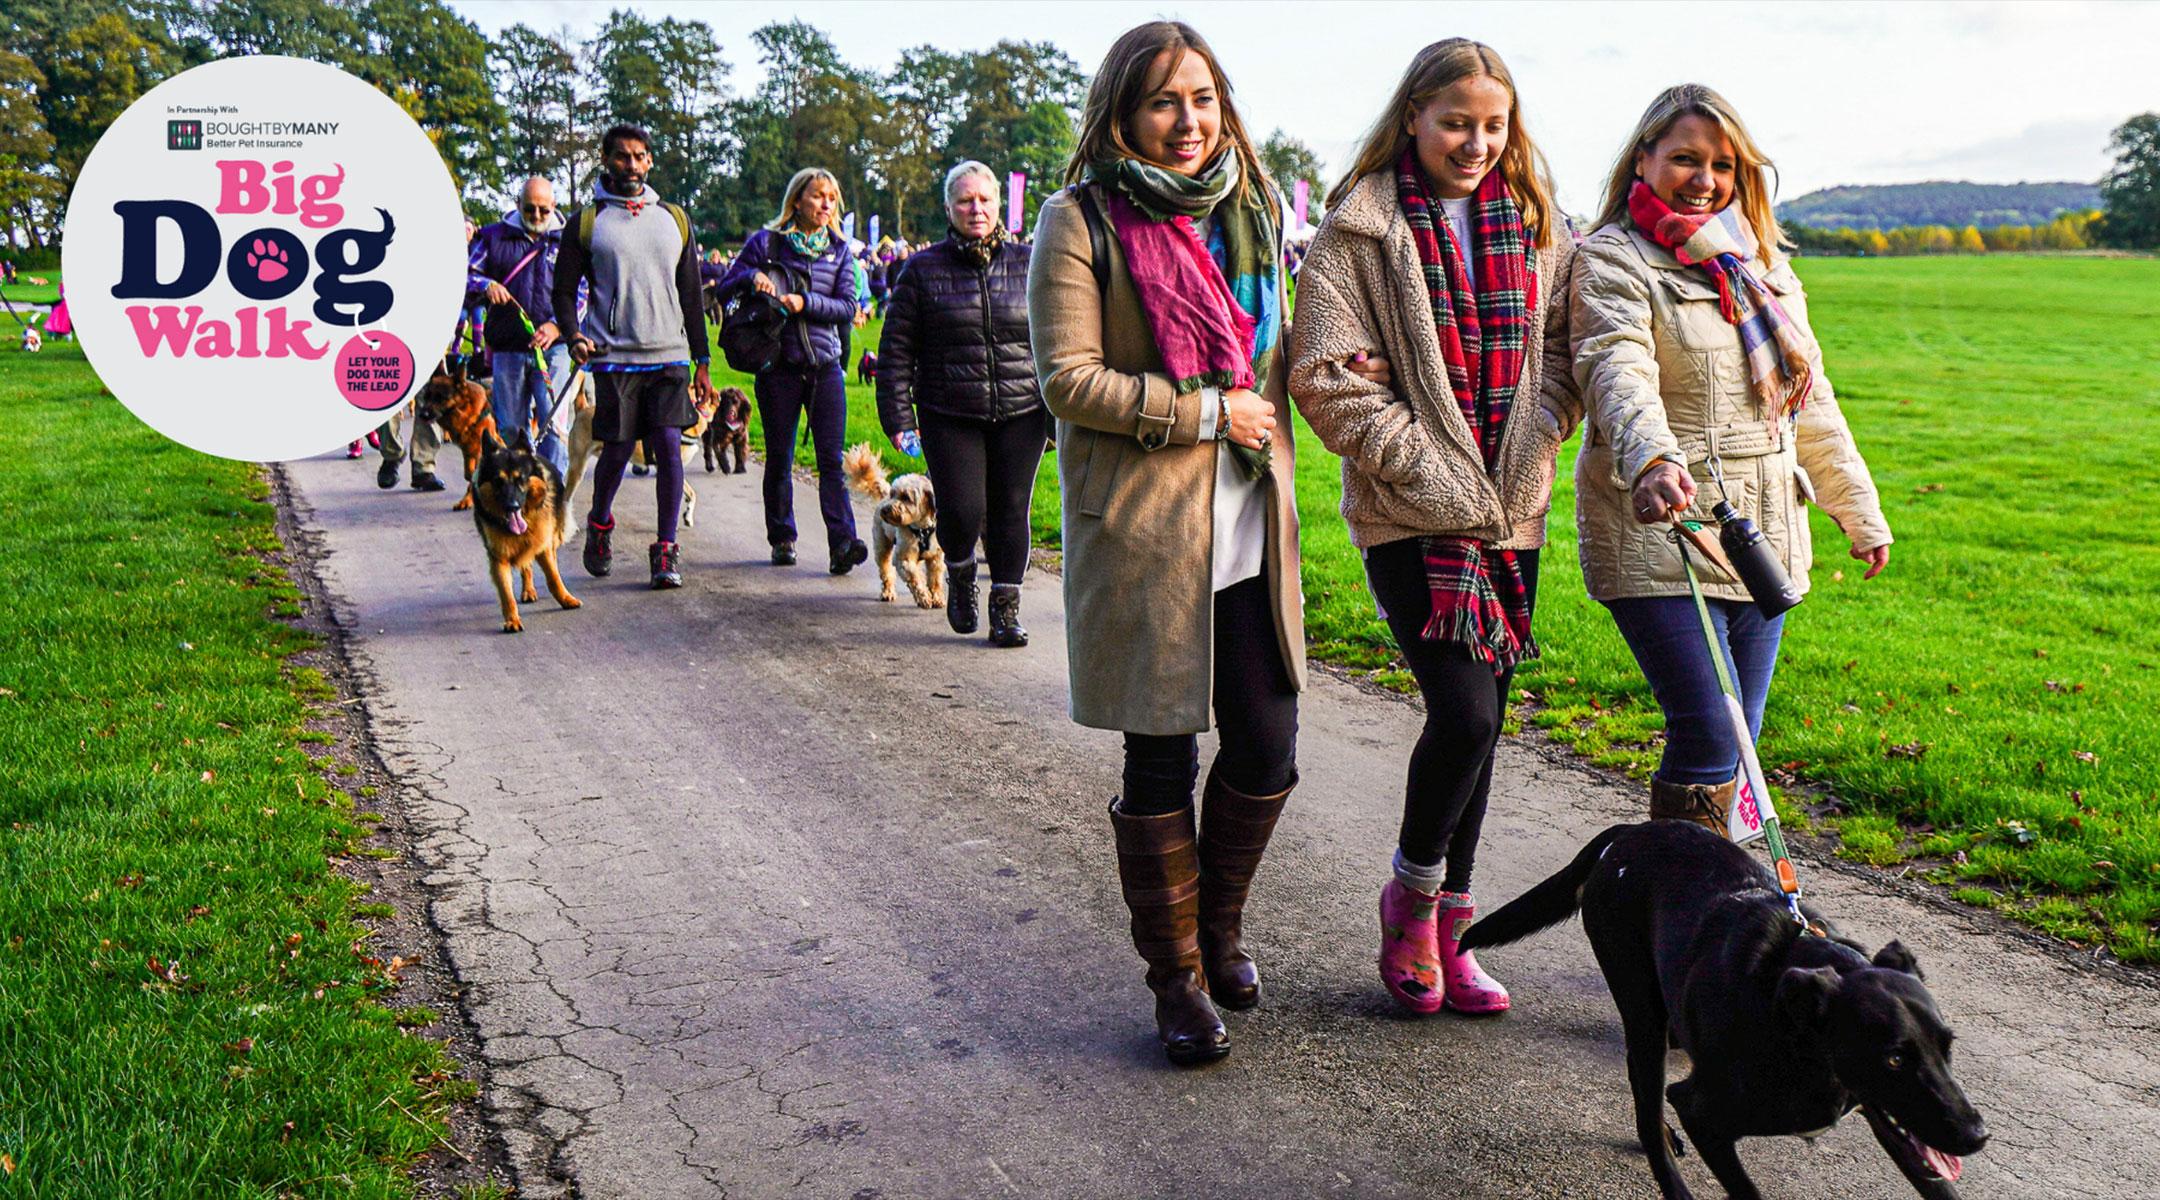 Big Dog Walk Leicestershire - 30 May